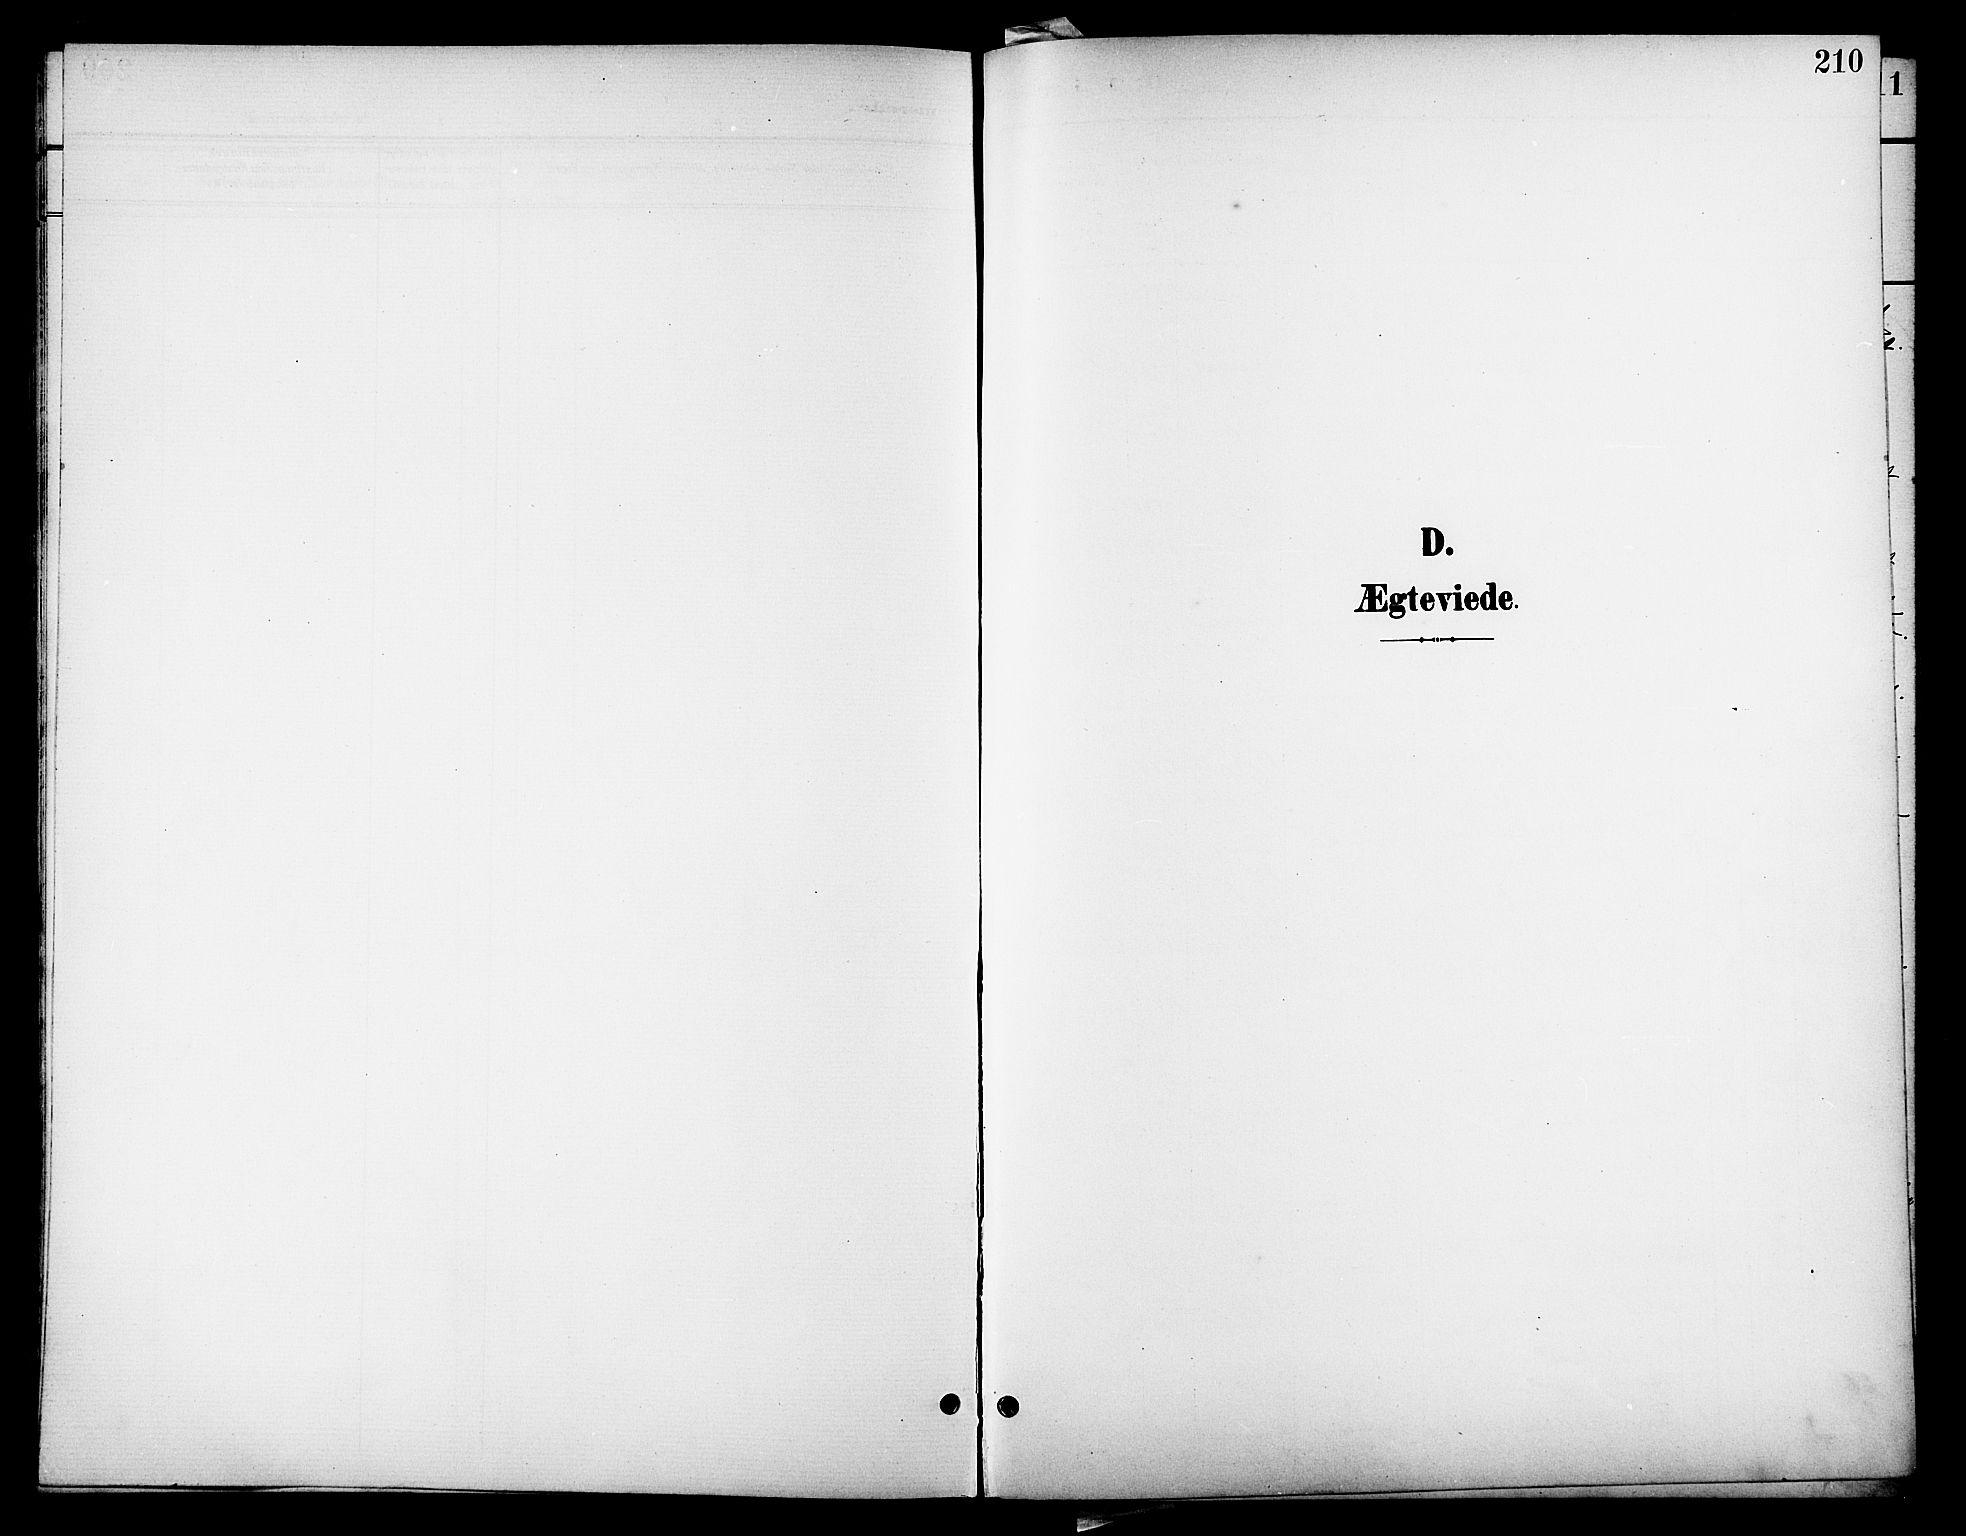 SAT, Ministerialprotokoller, klokkerbøker og fødselsregistre - Nordland, 801/L0033: Klokkerbok nr. 801C08, 1898-1910, s. 210